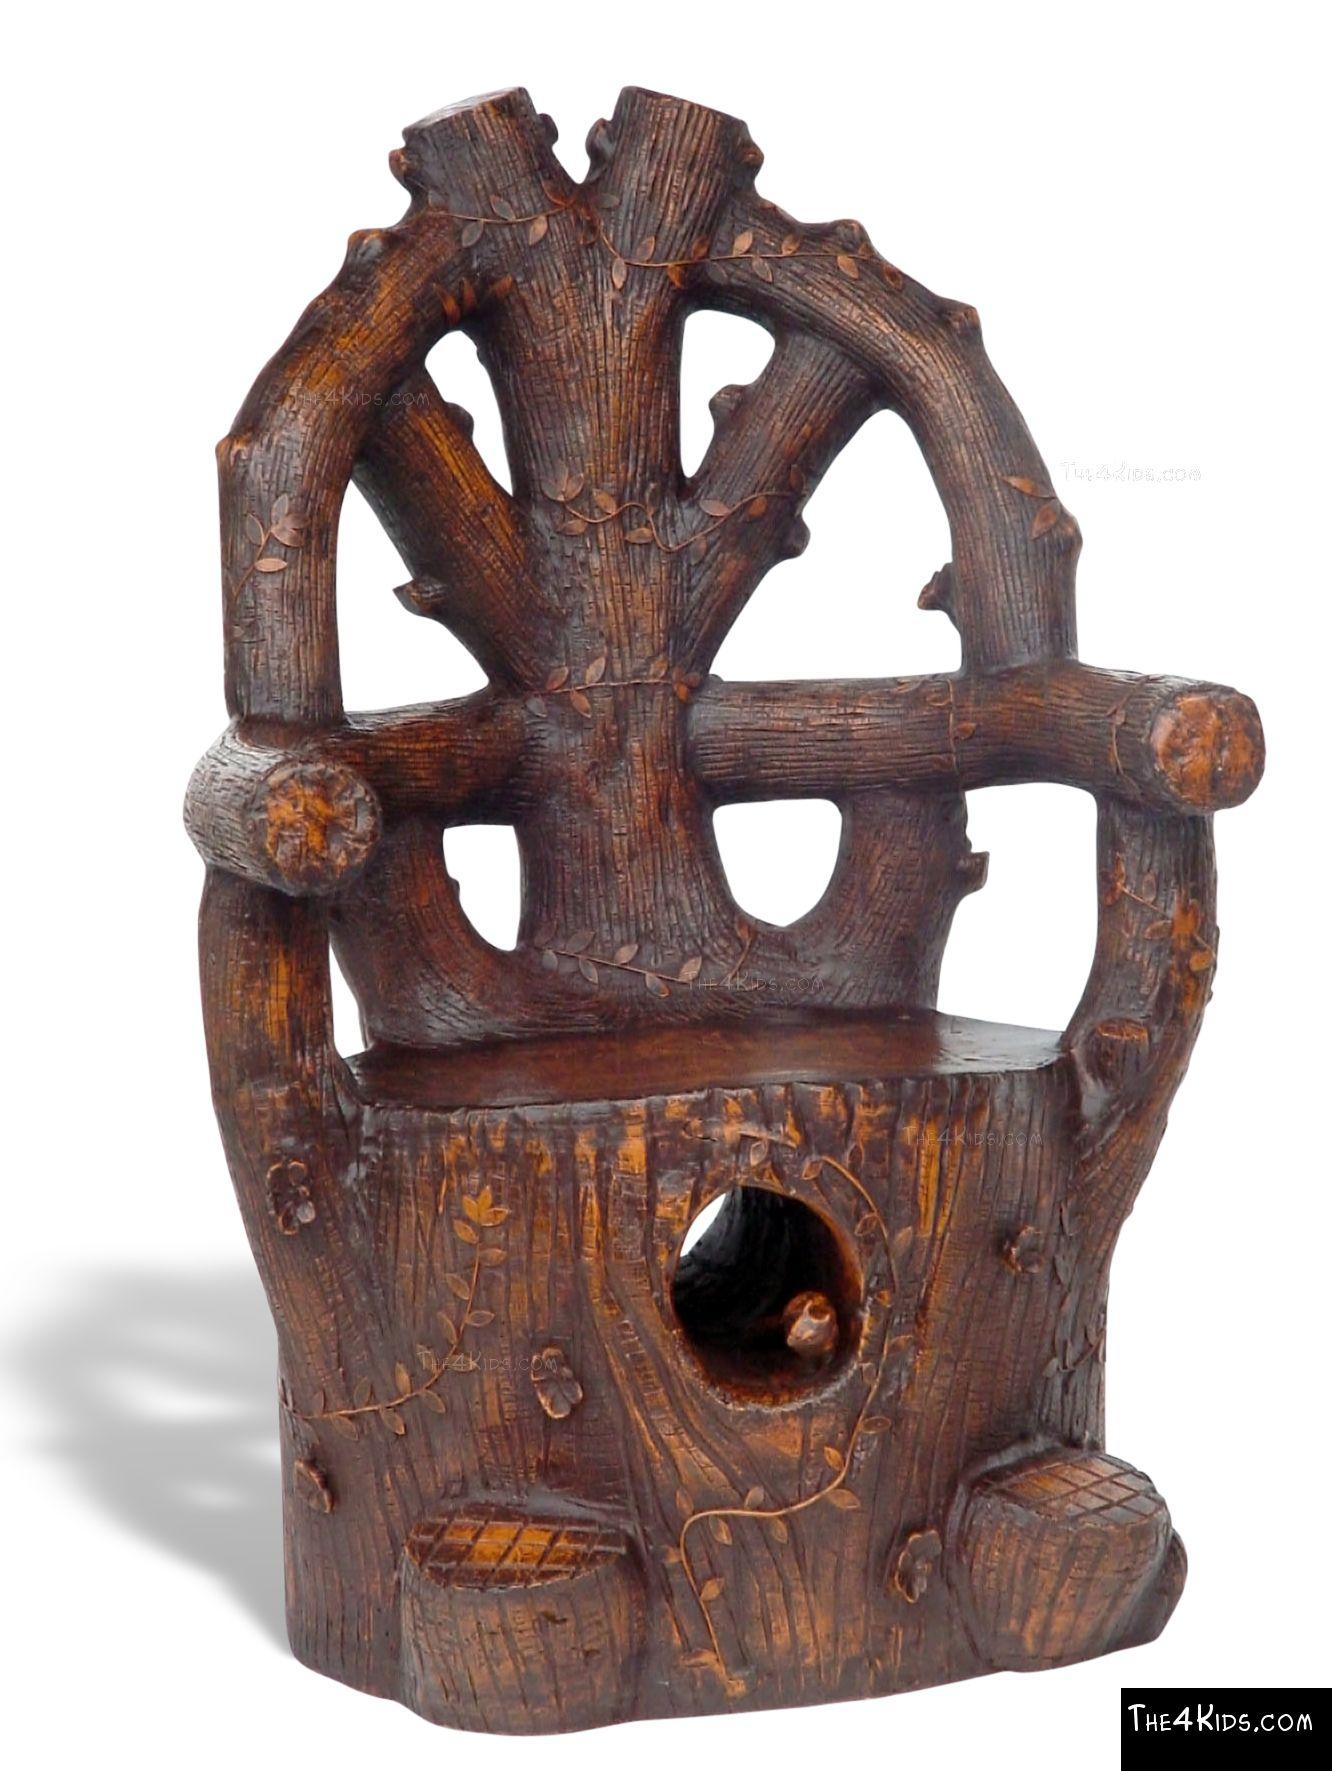 Rustic Log Chair - The 4 Kids